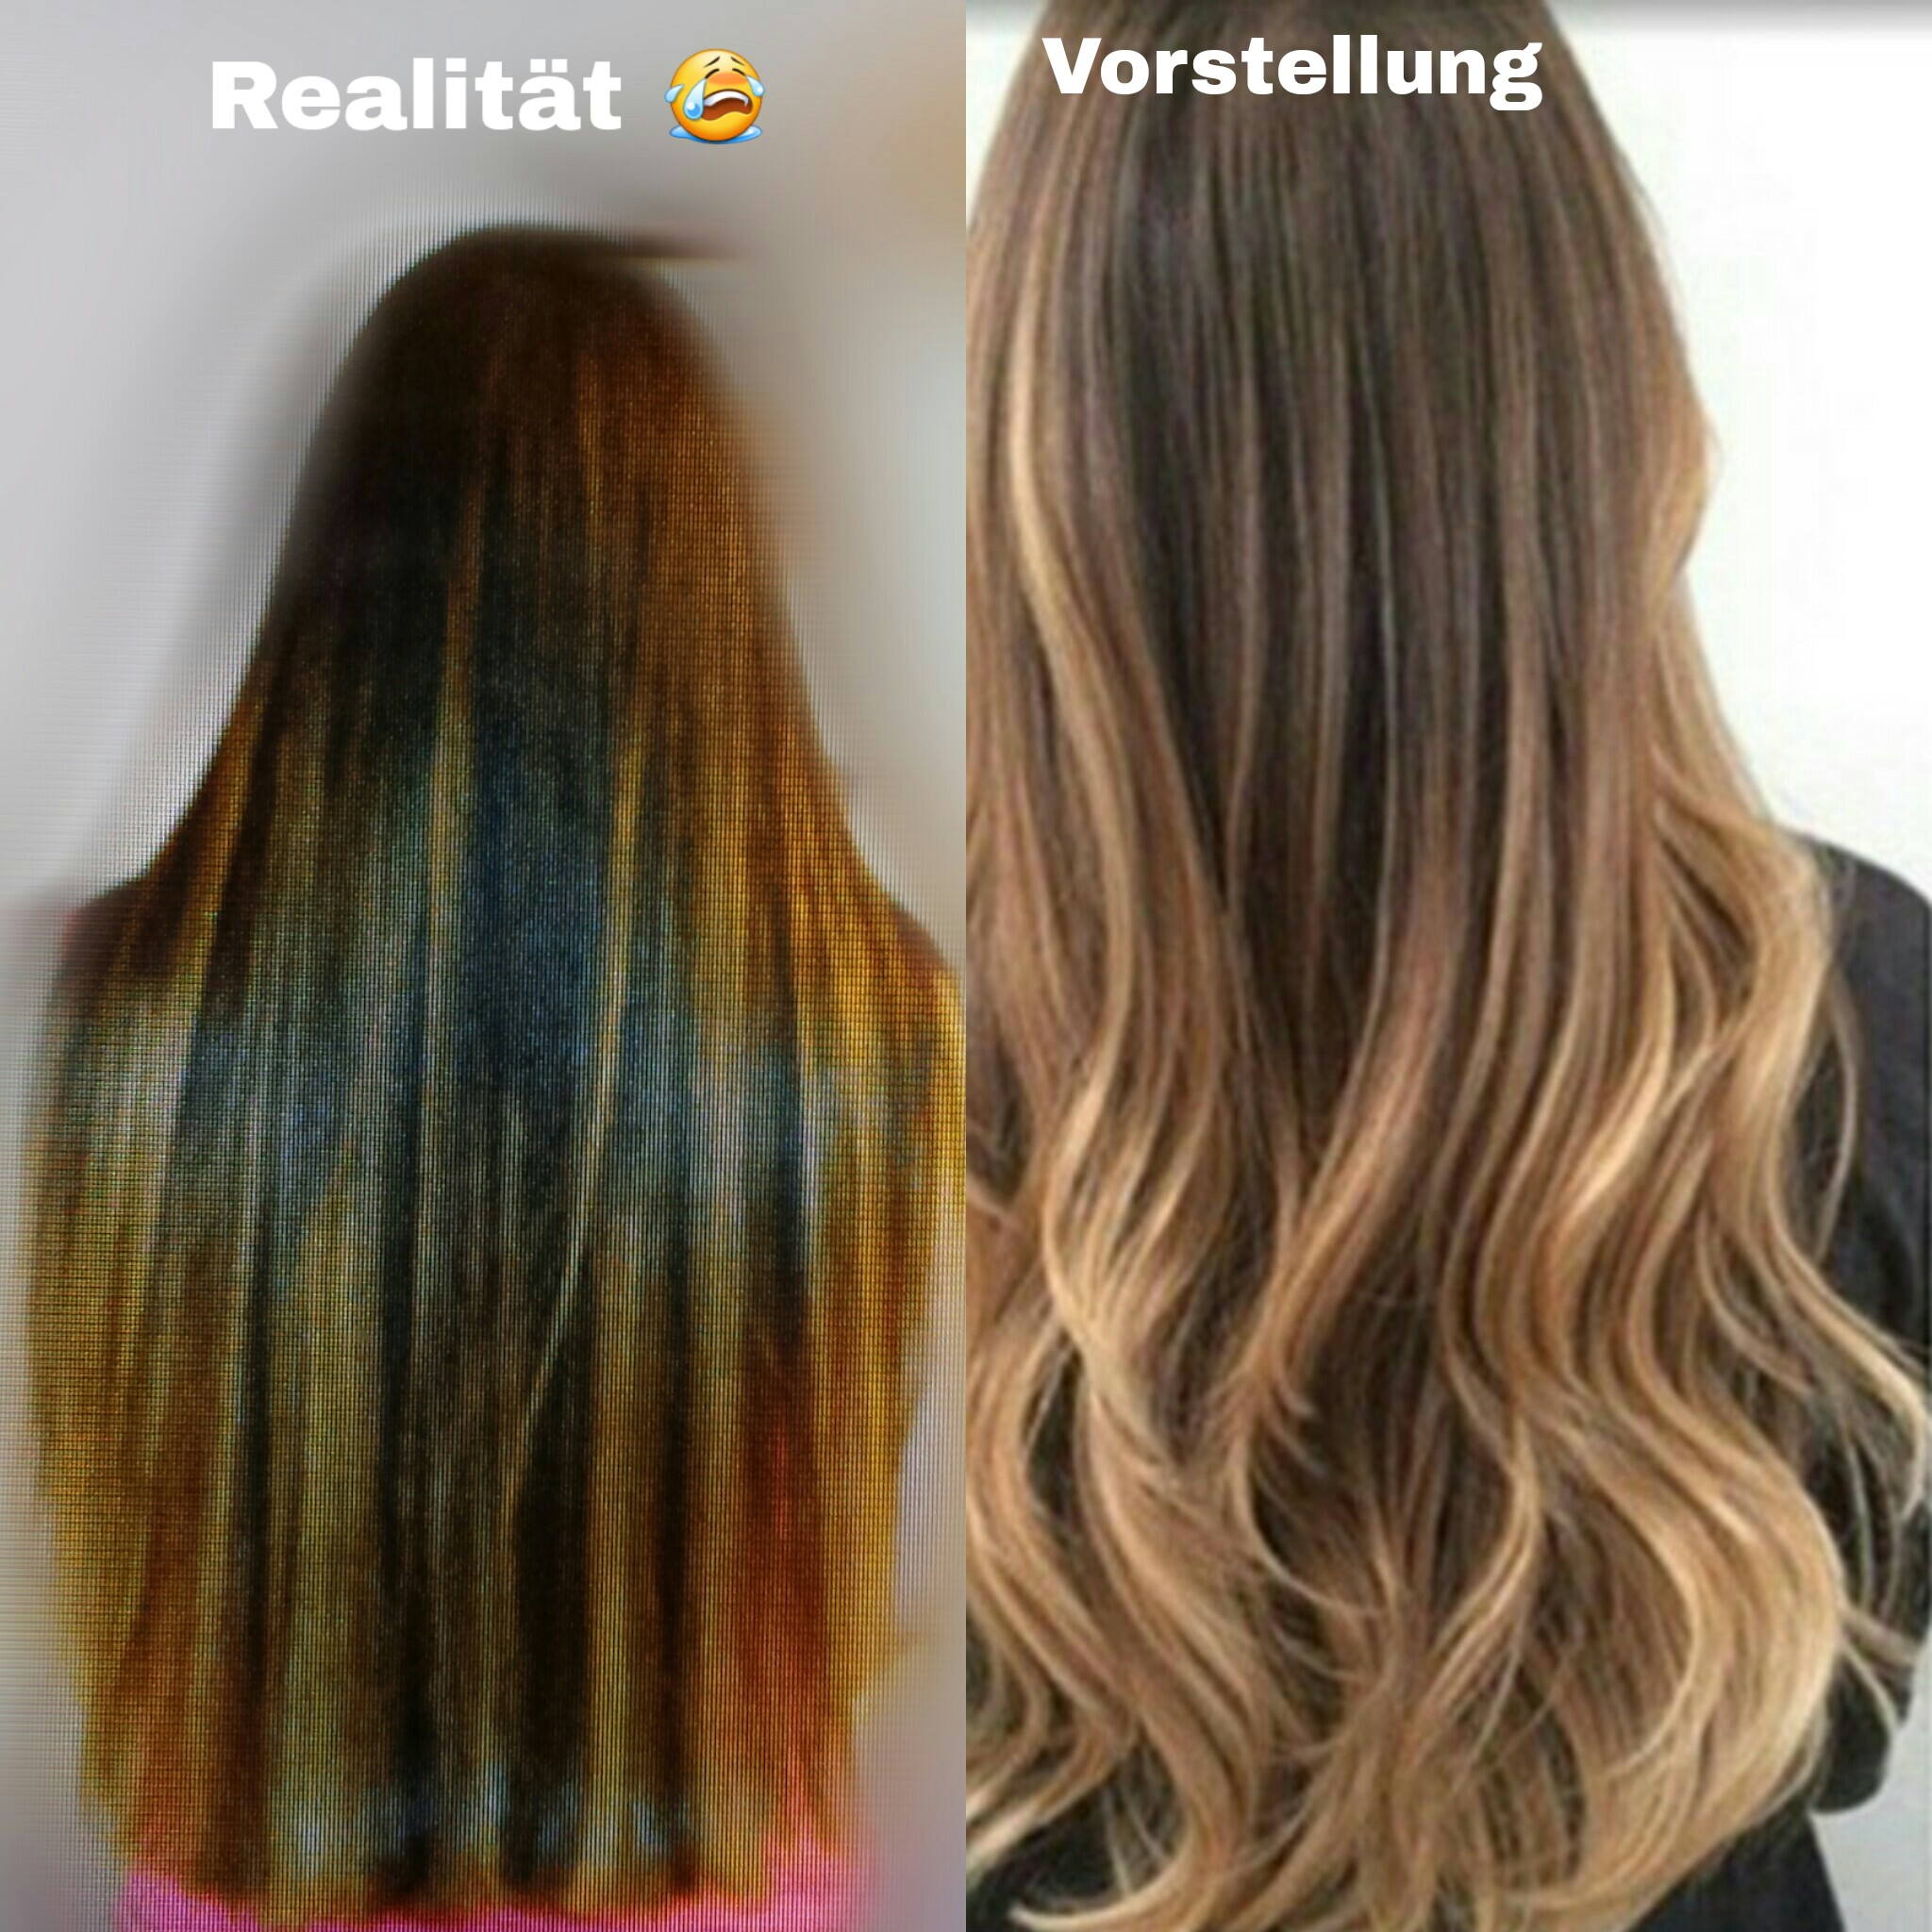 Neue Haarfarbe Online Simulieren